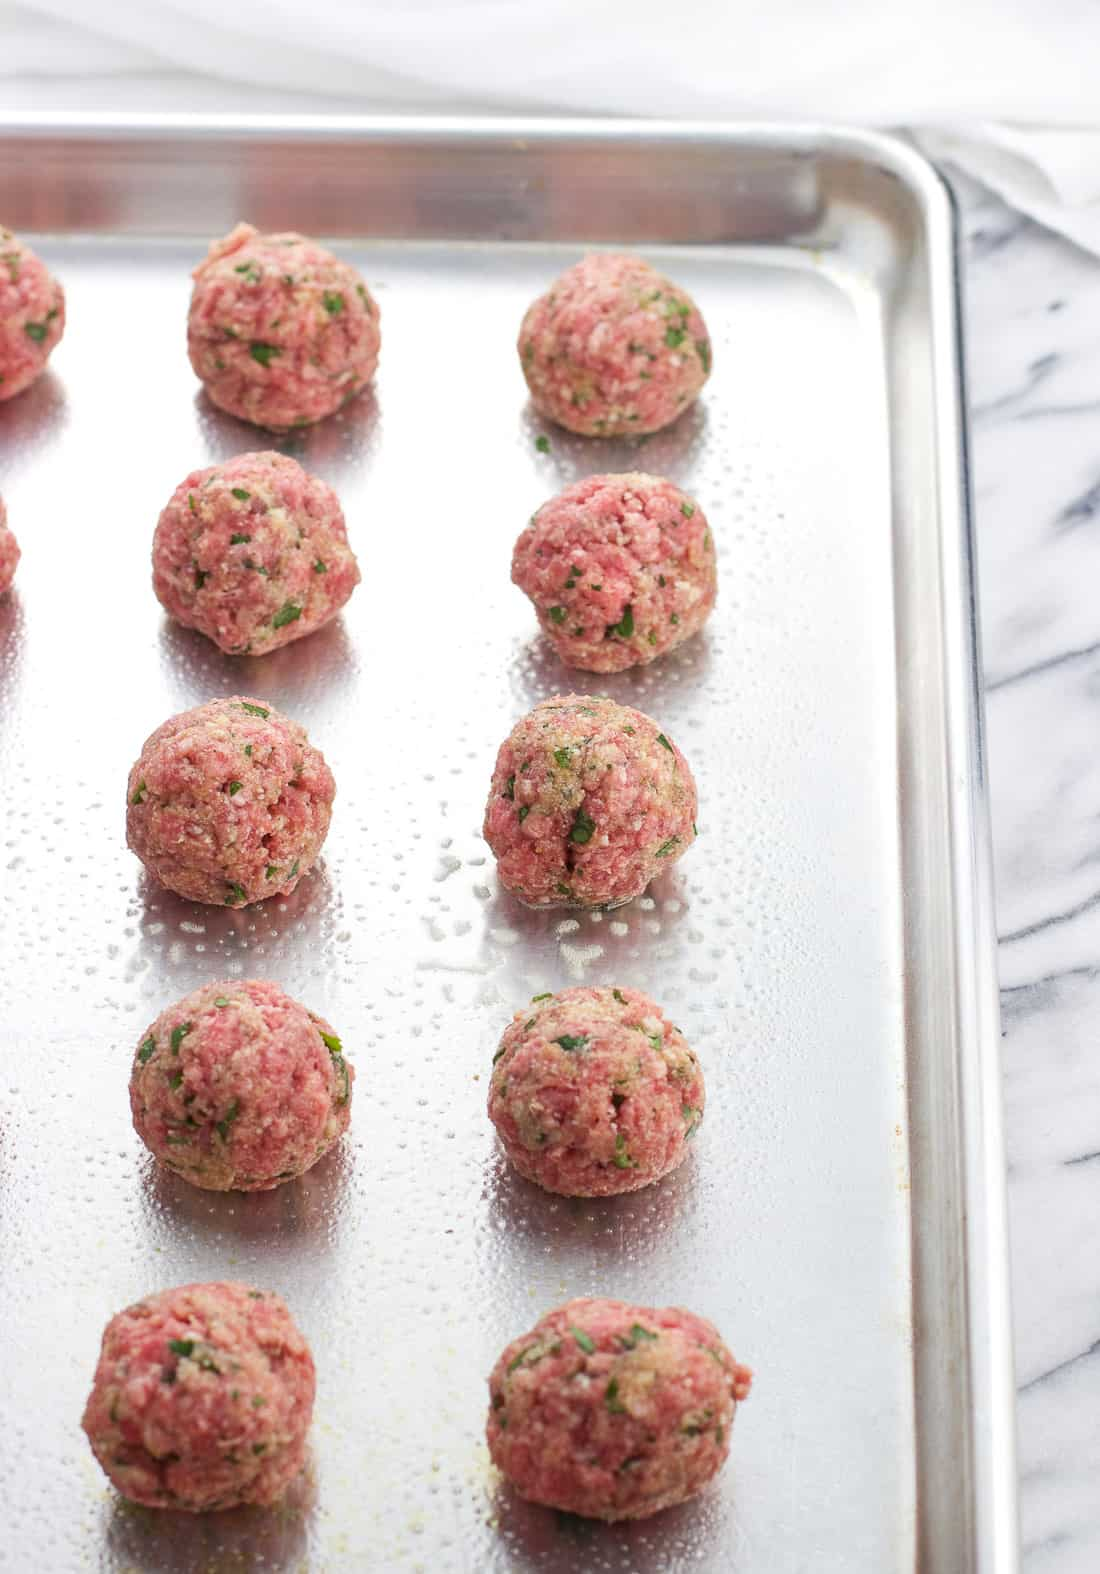 Raw meatballs lined up on an aluminum baking sheet.